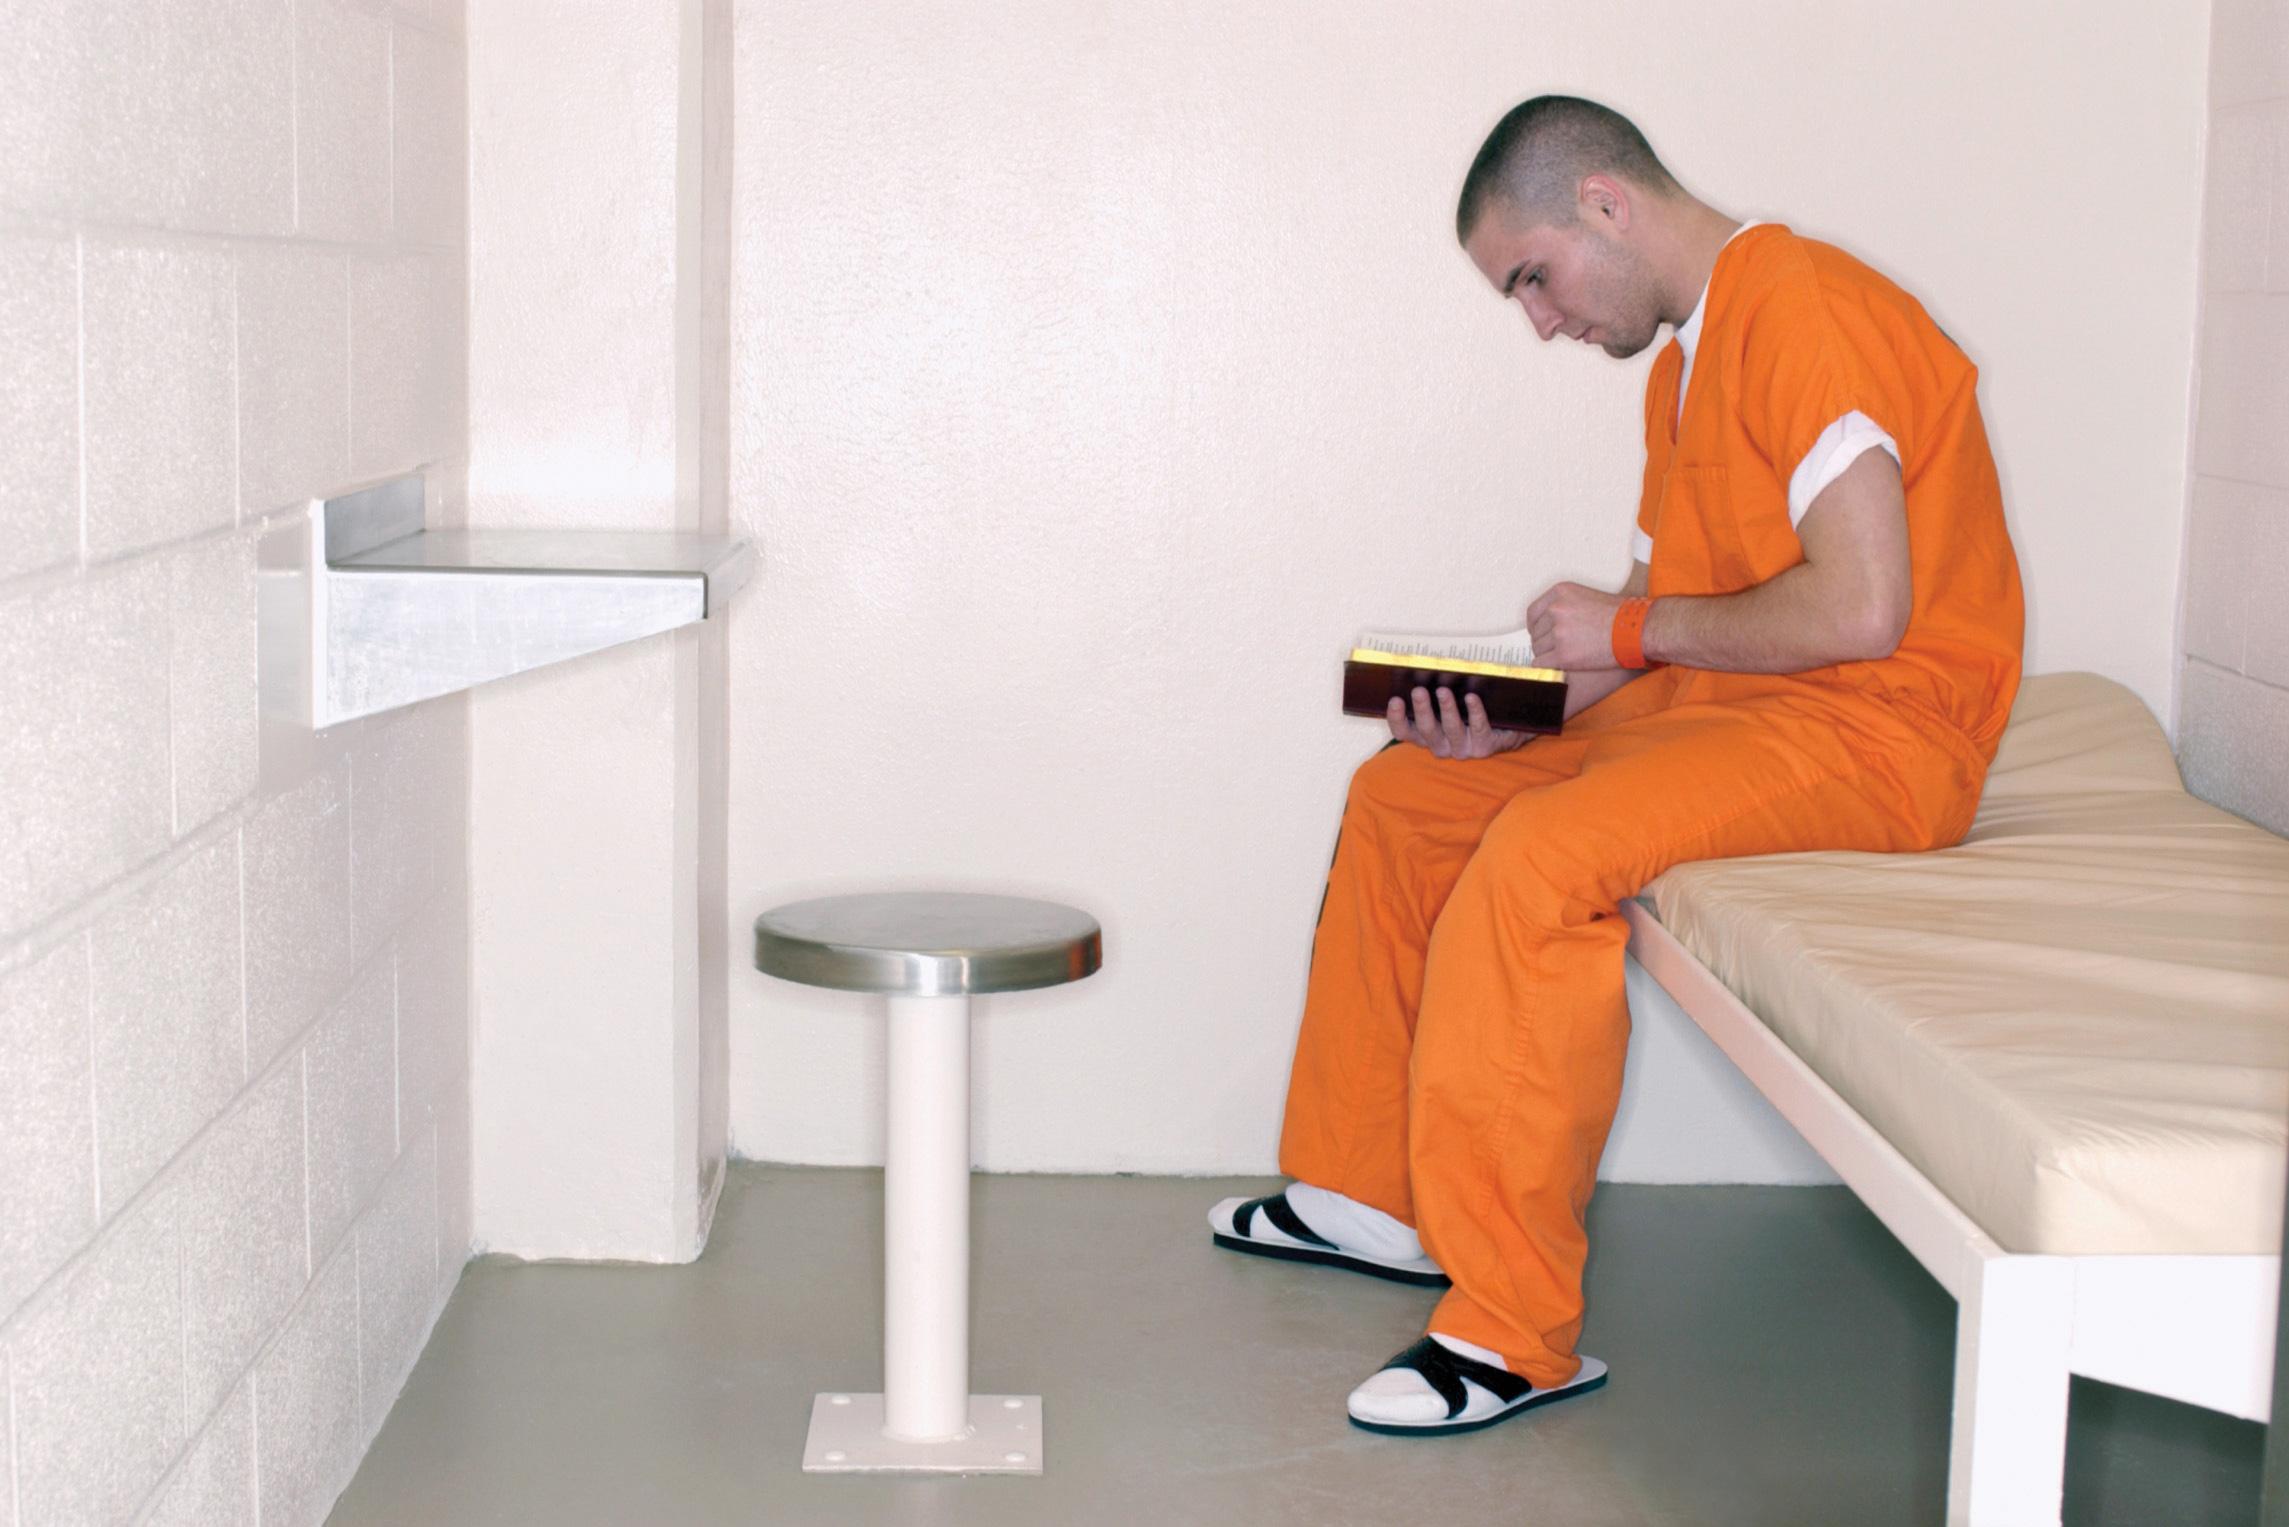 New Hire Detention Deputy Resume Objective